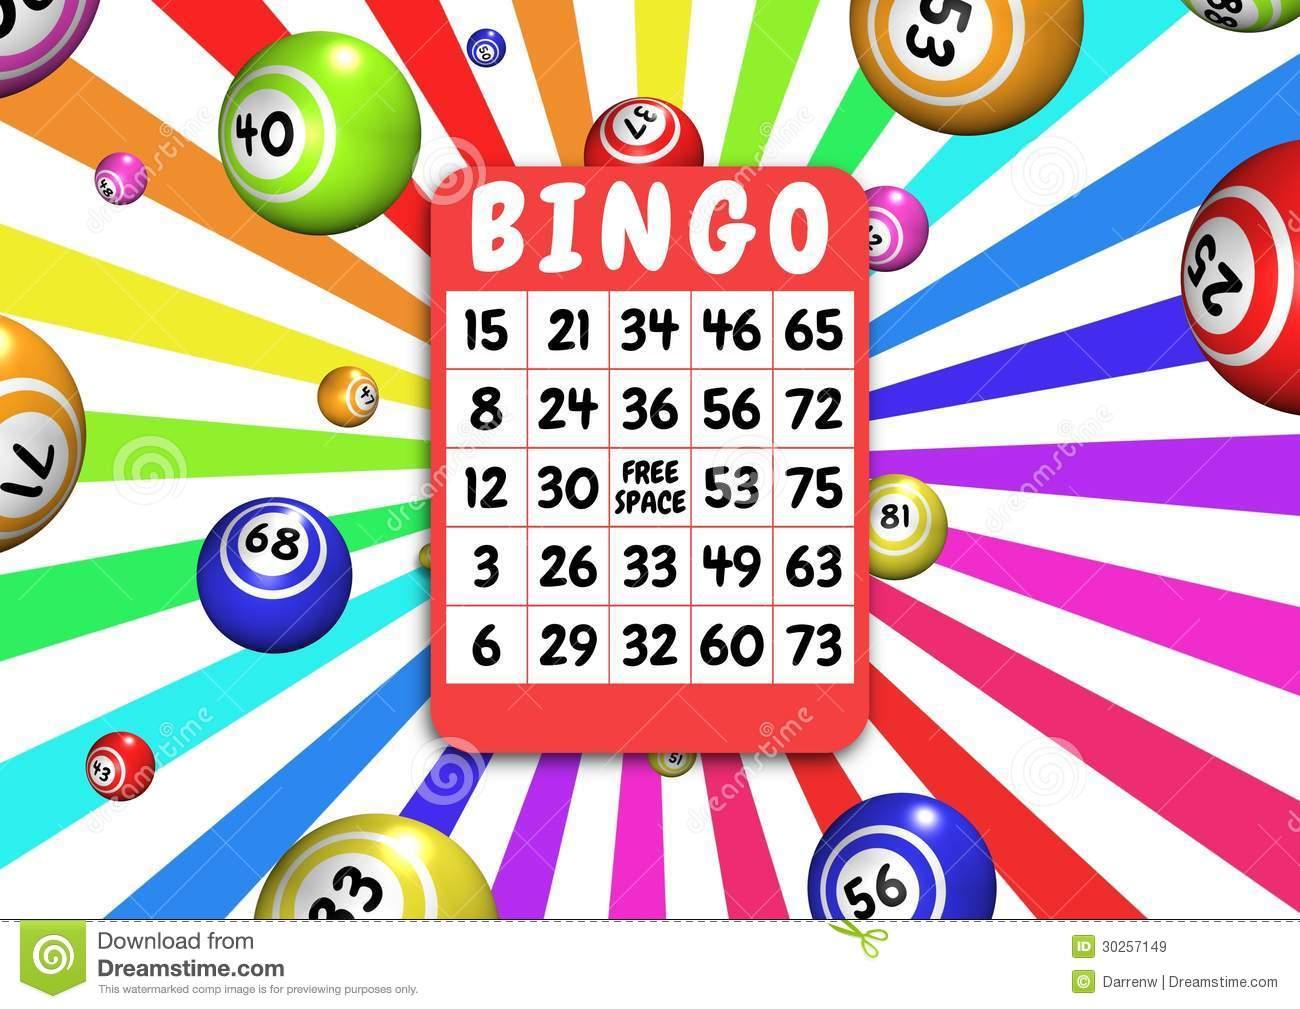 Bingo Card Clipart Free